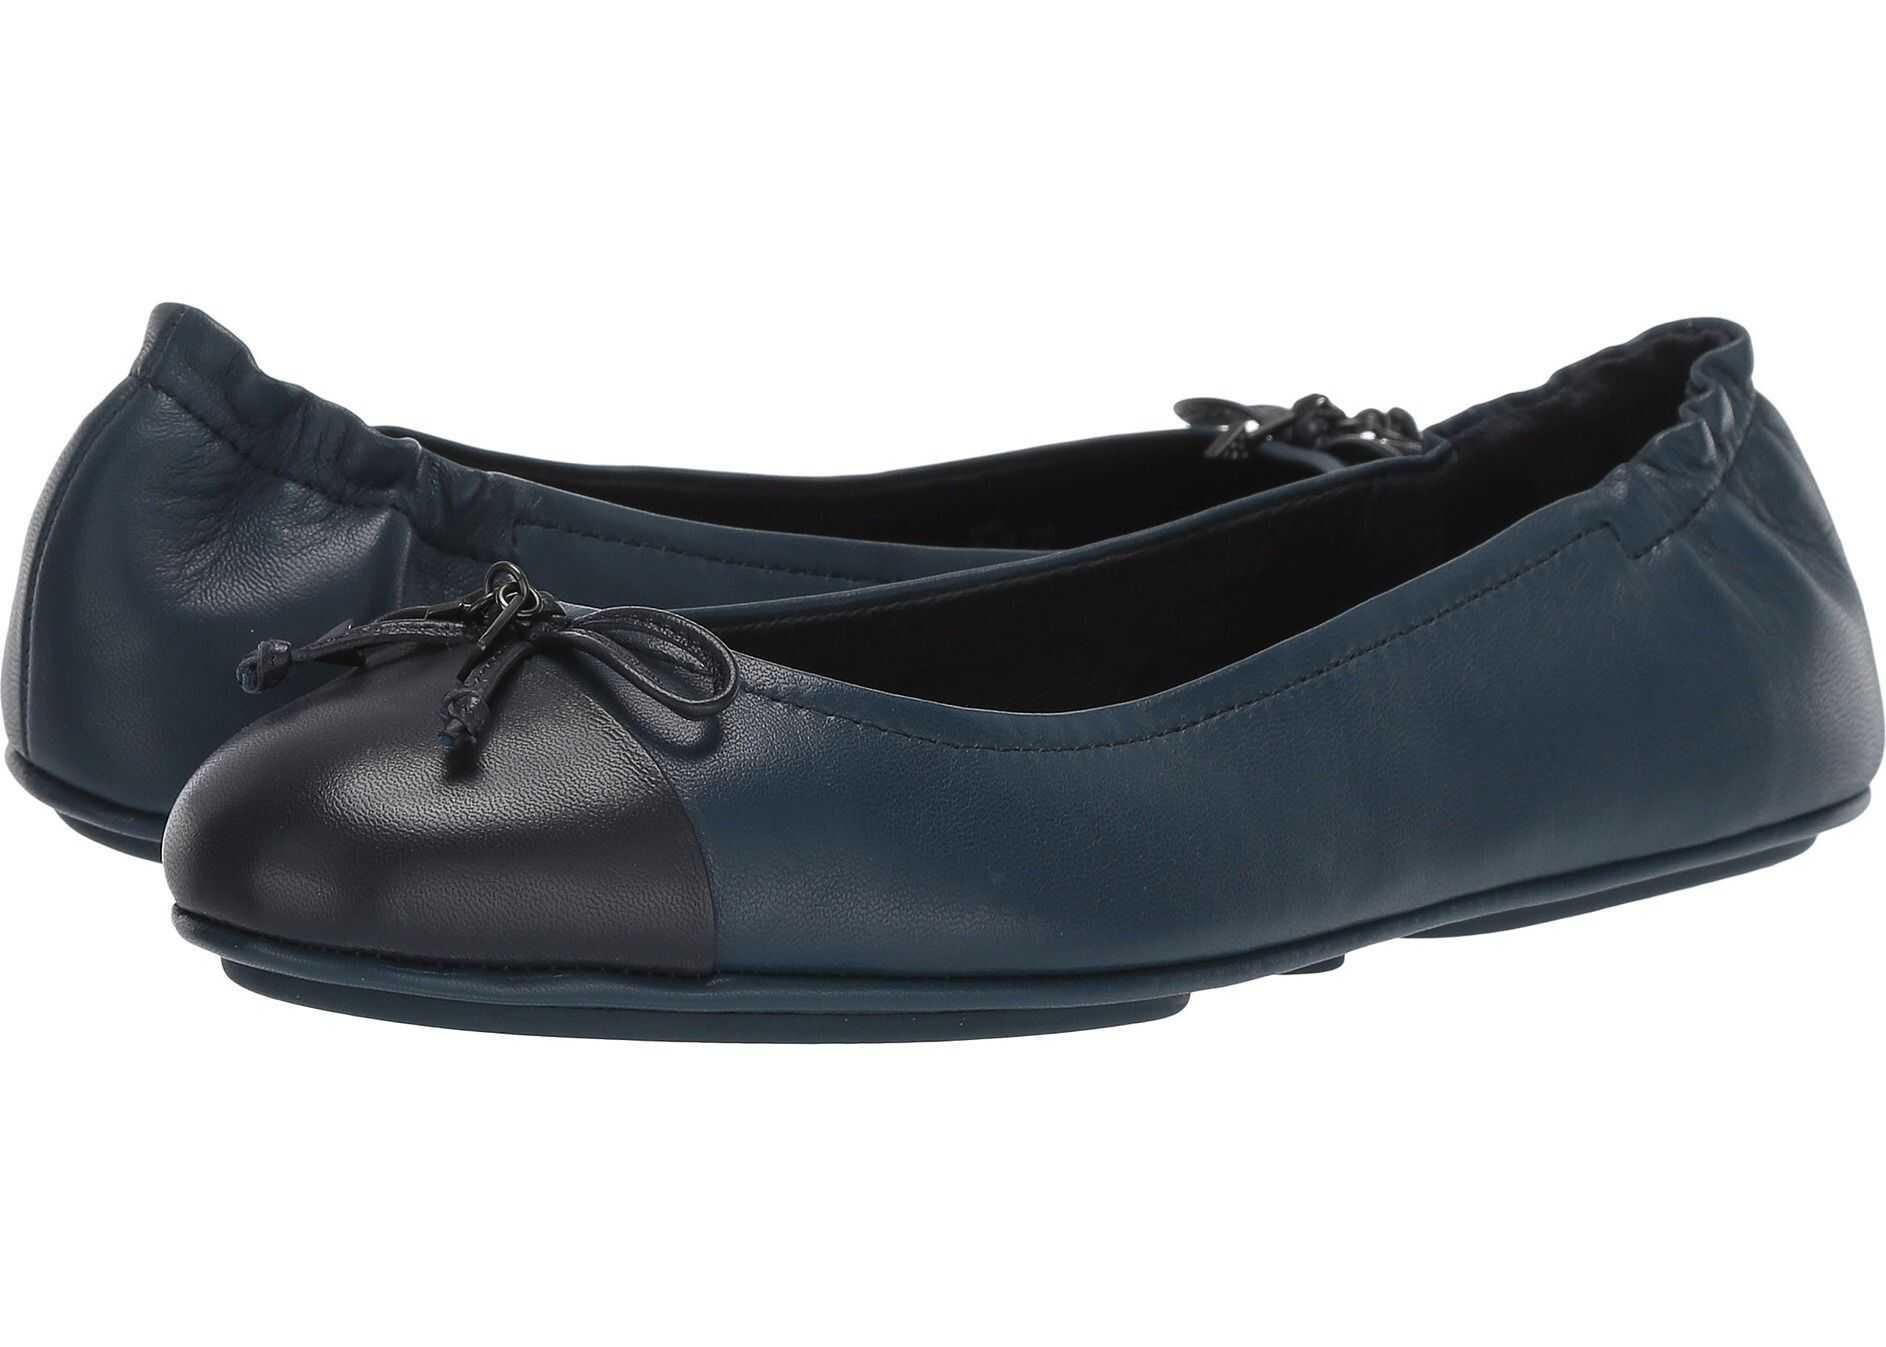 COACH Pearl Foldable Ballet - Leather Midnight Navy/Dark Denim